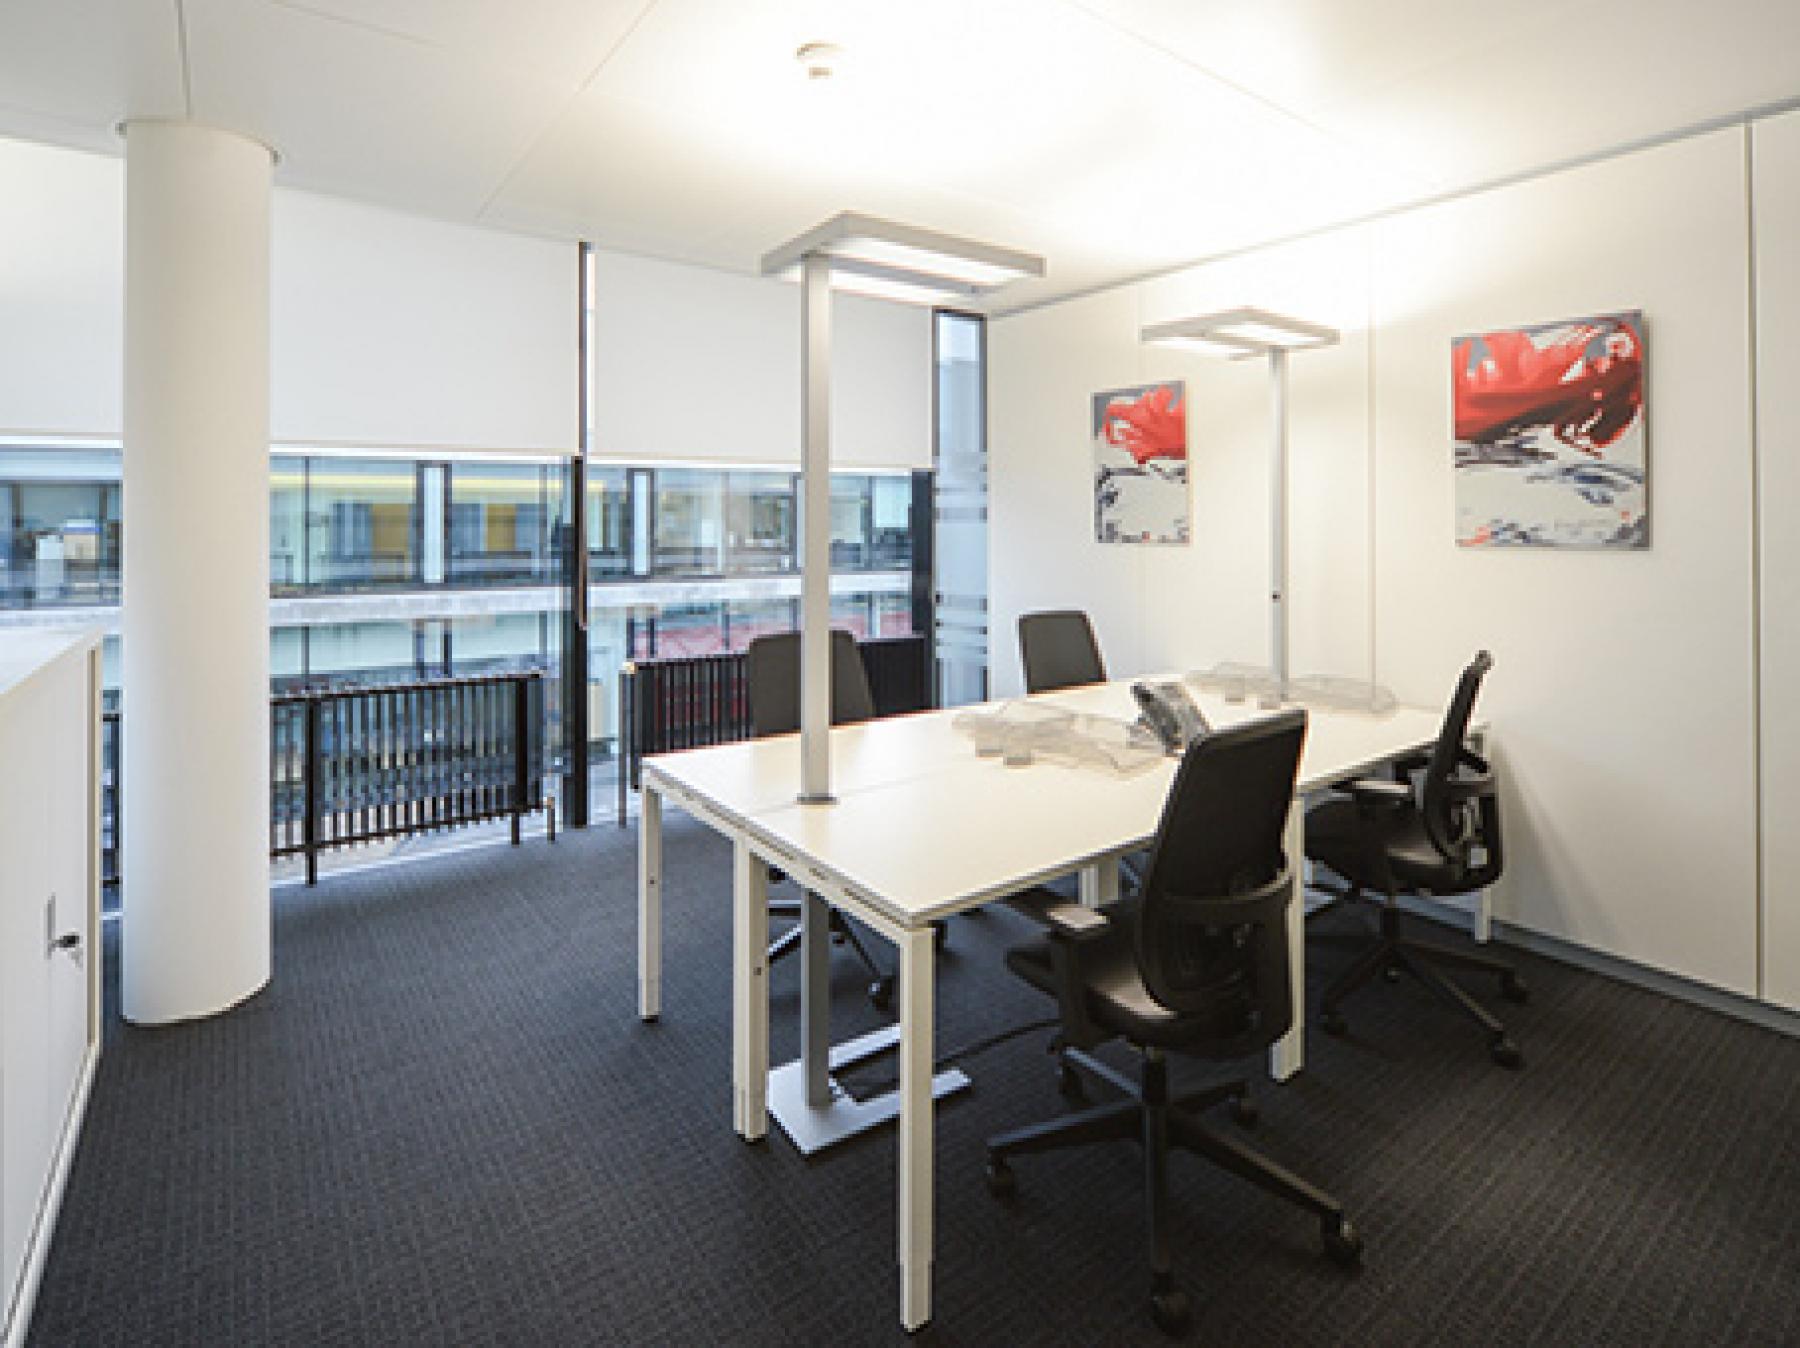 Helles Büro mieten im Business Center in Zürich-Wiedikon